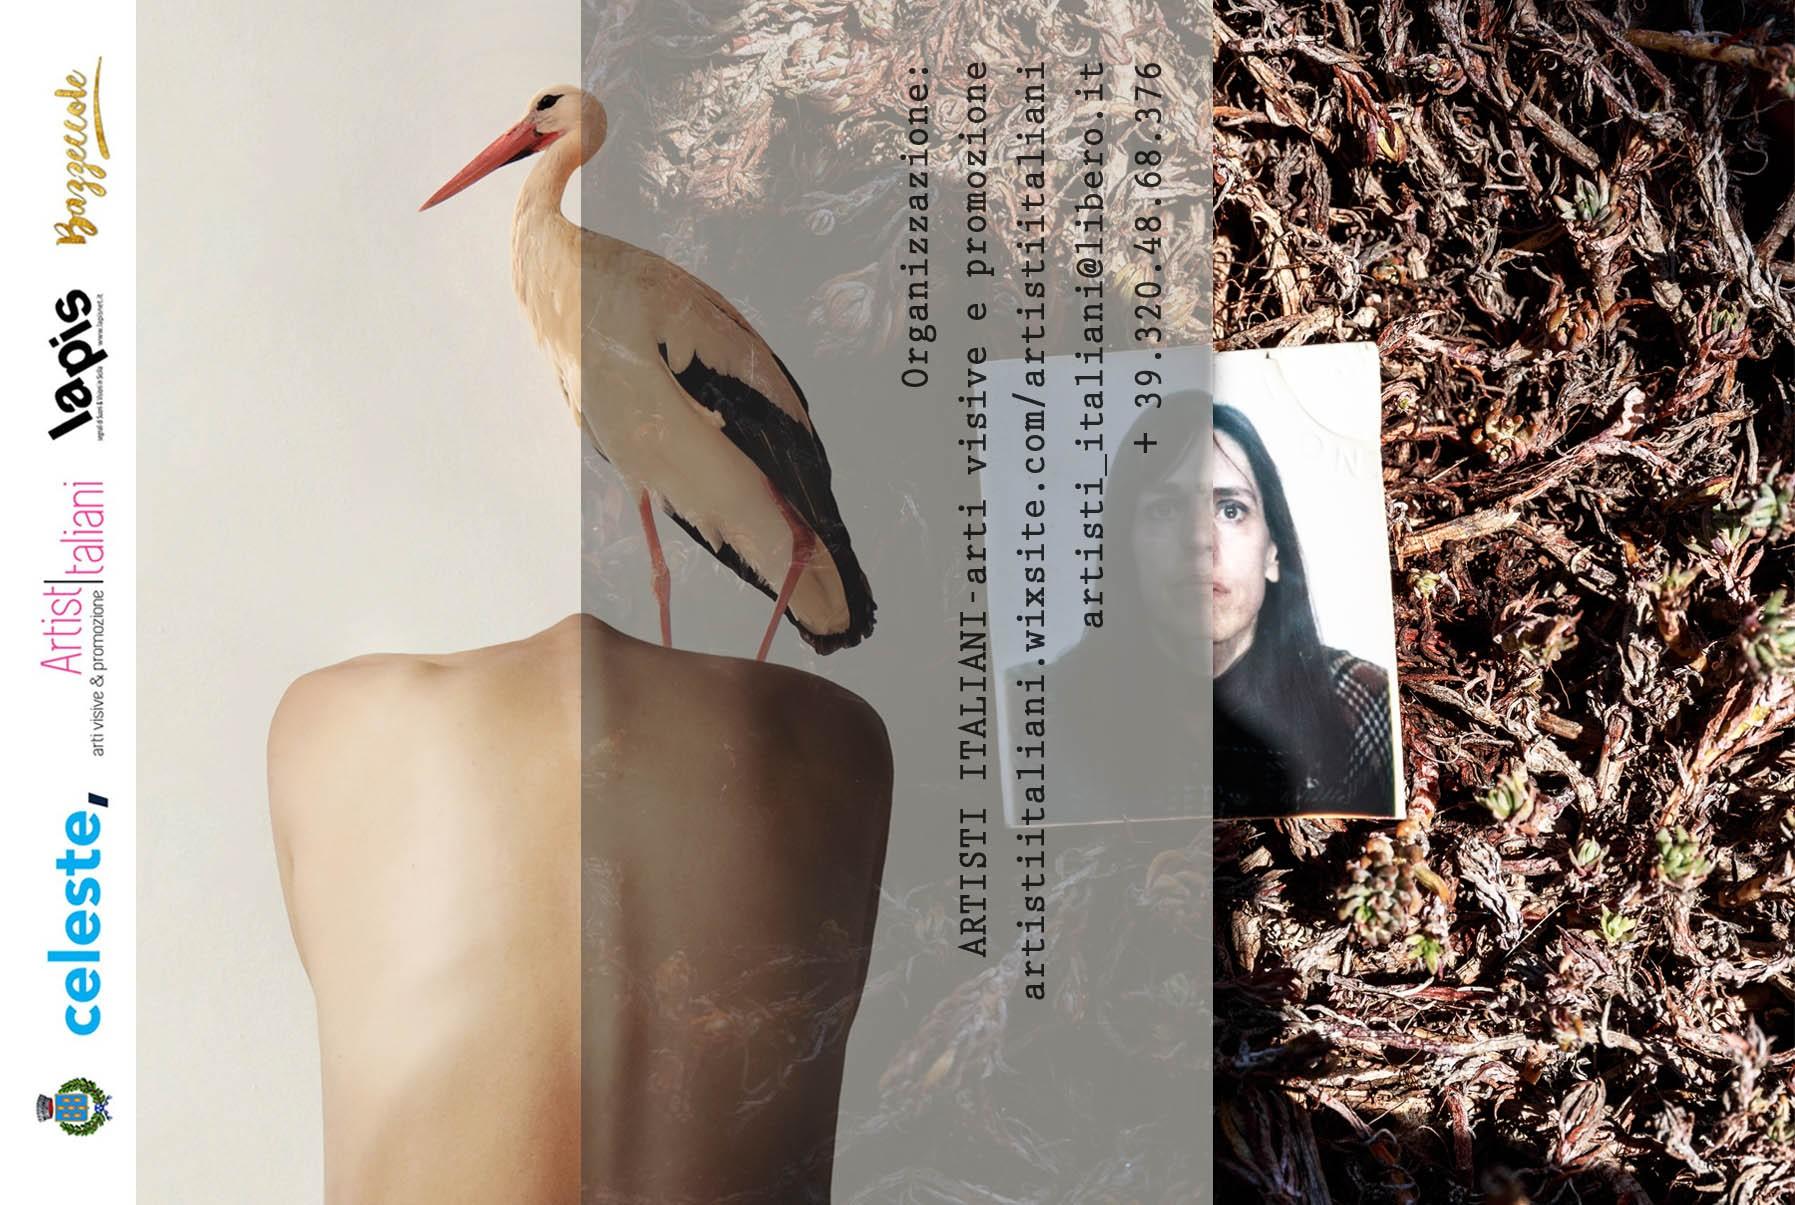 I-declare-my-shadow-gallery-benefit-celeste-prize-2017-alexi-paladino.jpg